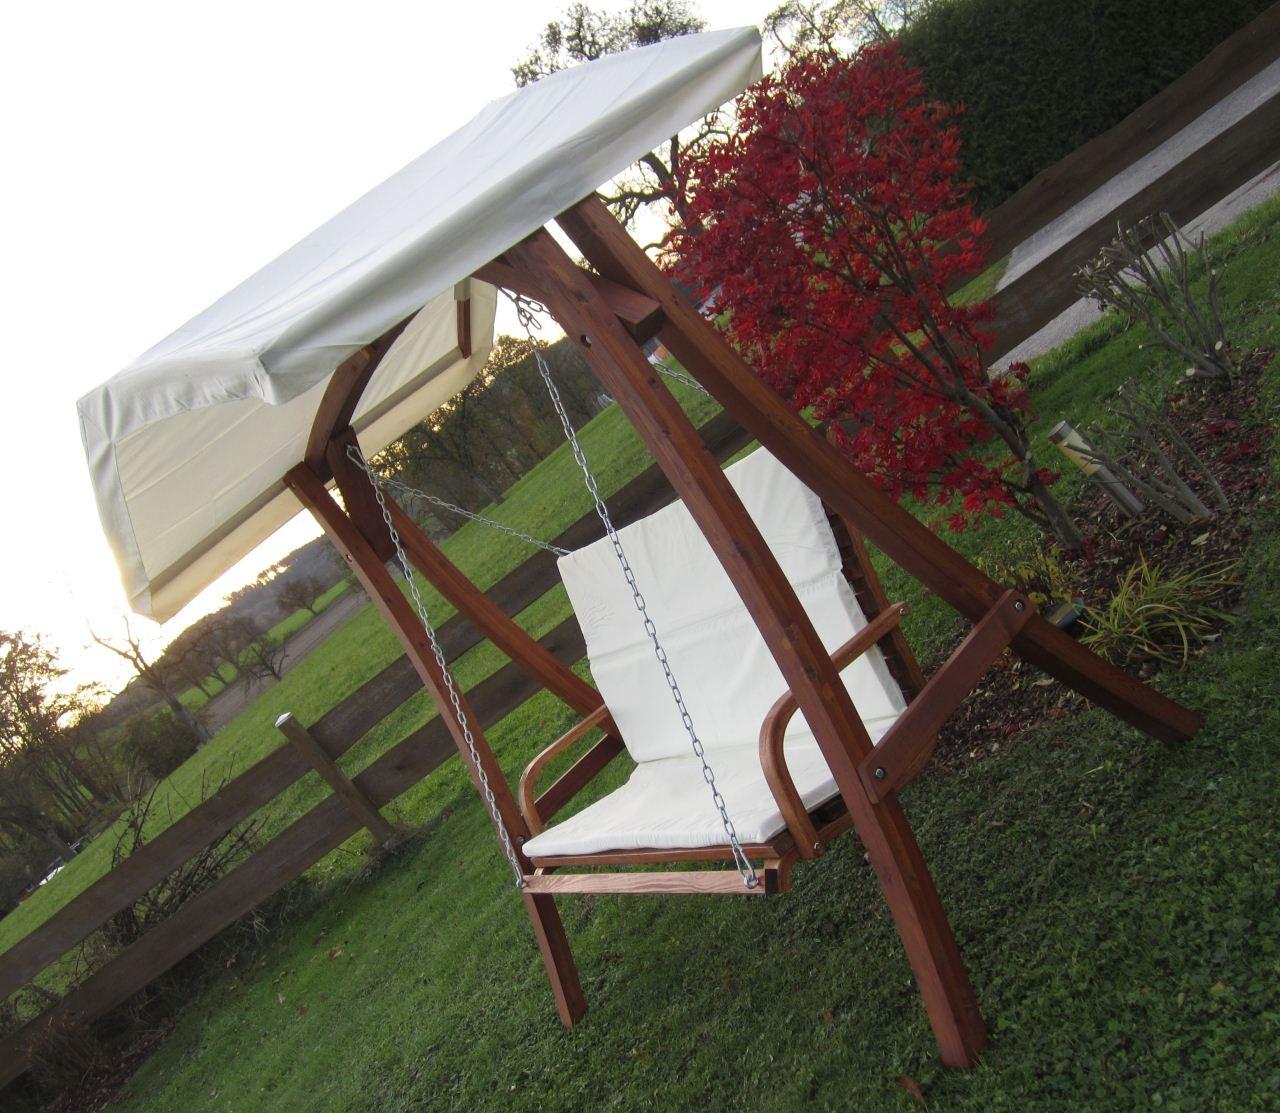 design hollywoodschaukel aus holz l rche model kuredo mit dach ebay. Black Bedroom Furniture Sets. Home Design Ideas